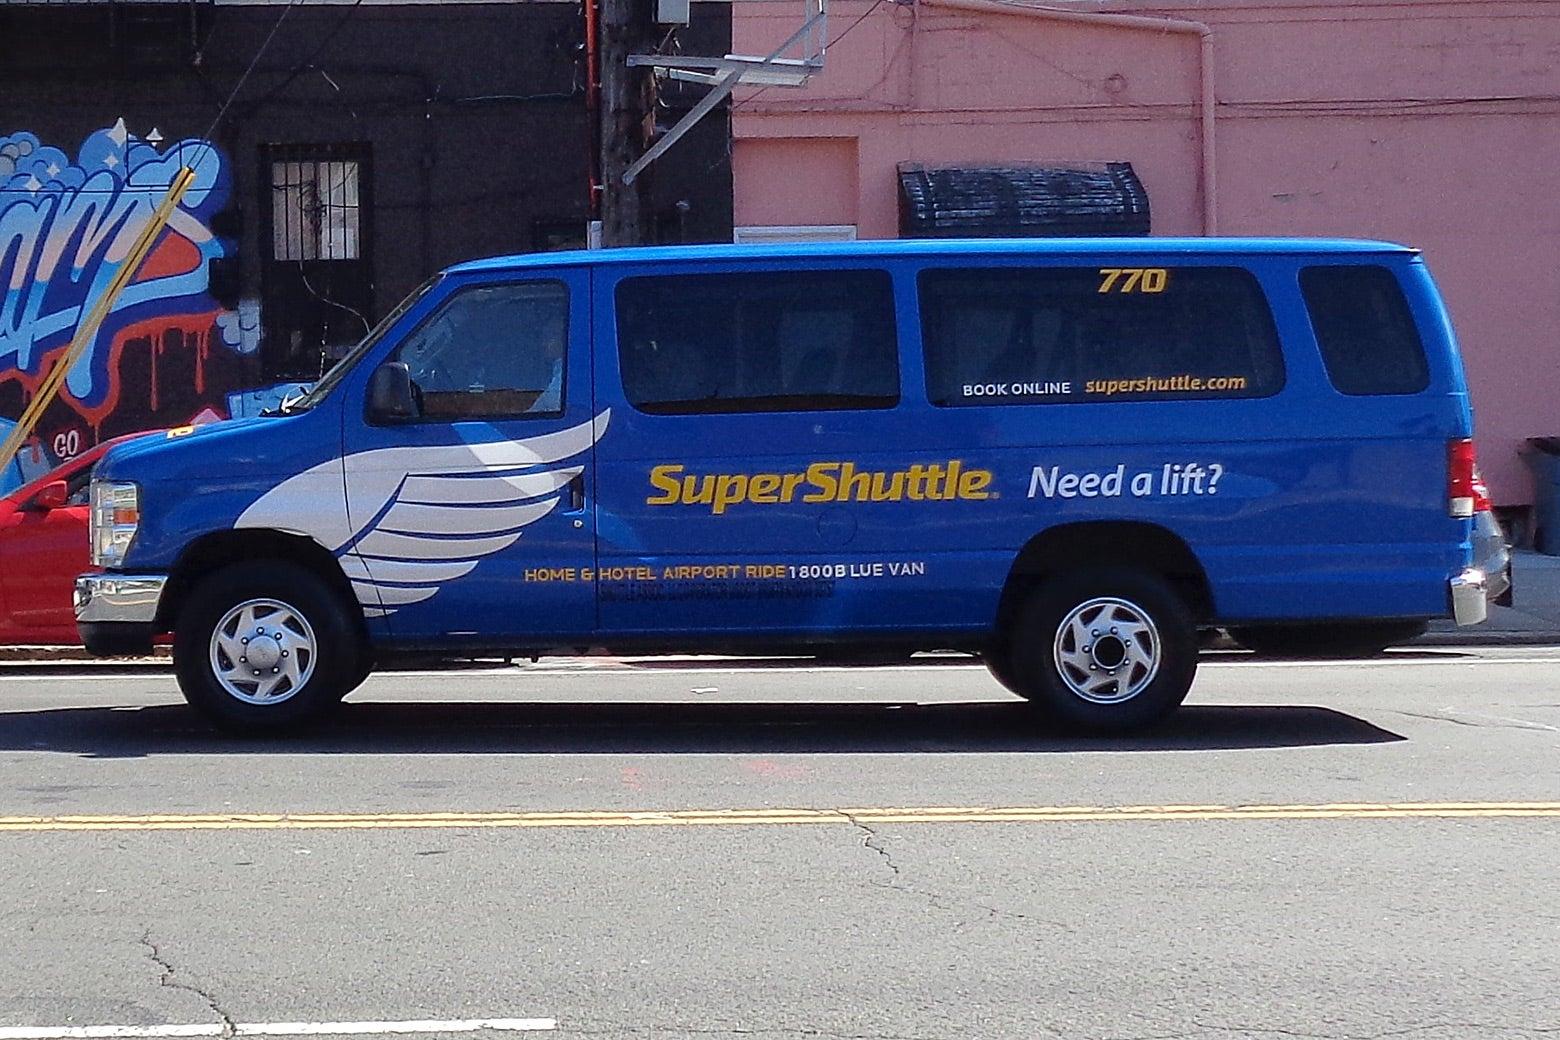 A SuperShuttle van.